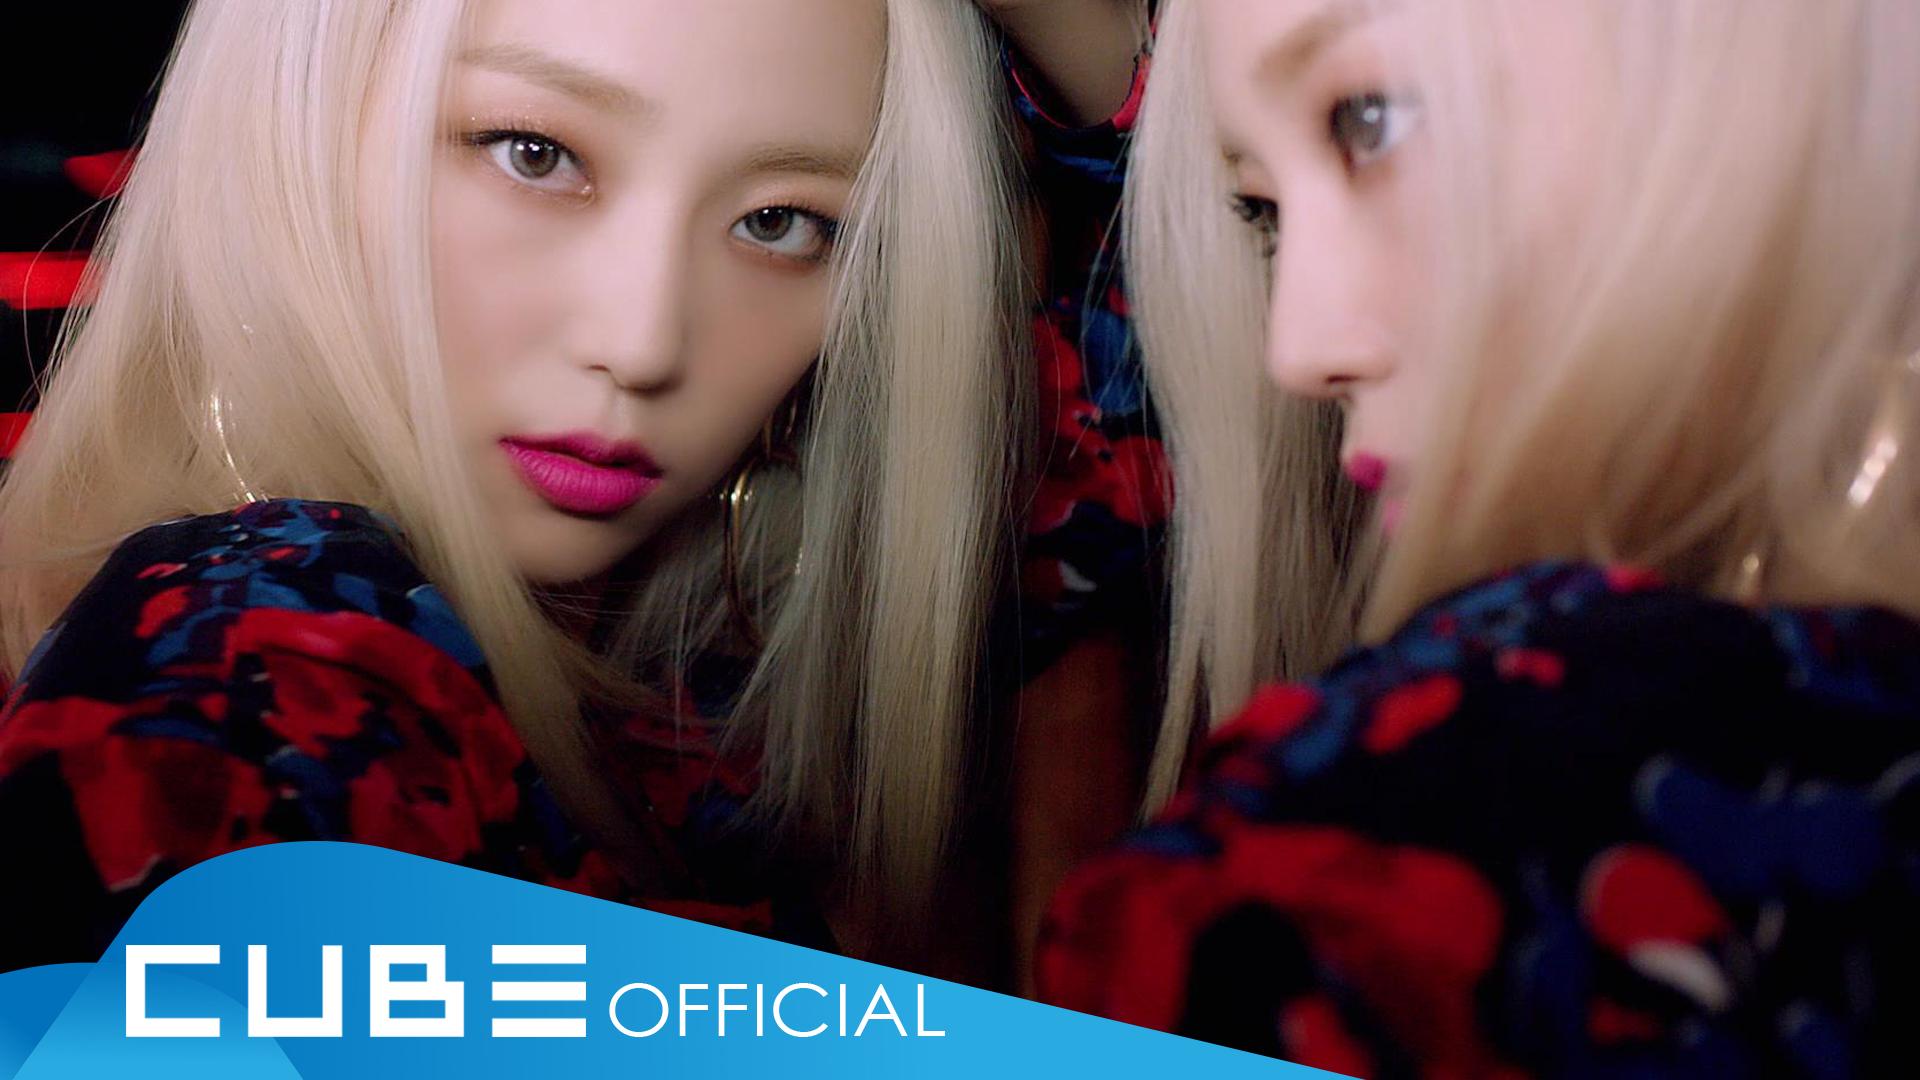 CLC - 'No' Official Music Video